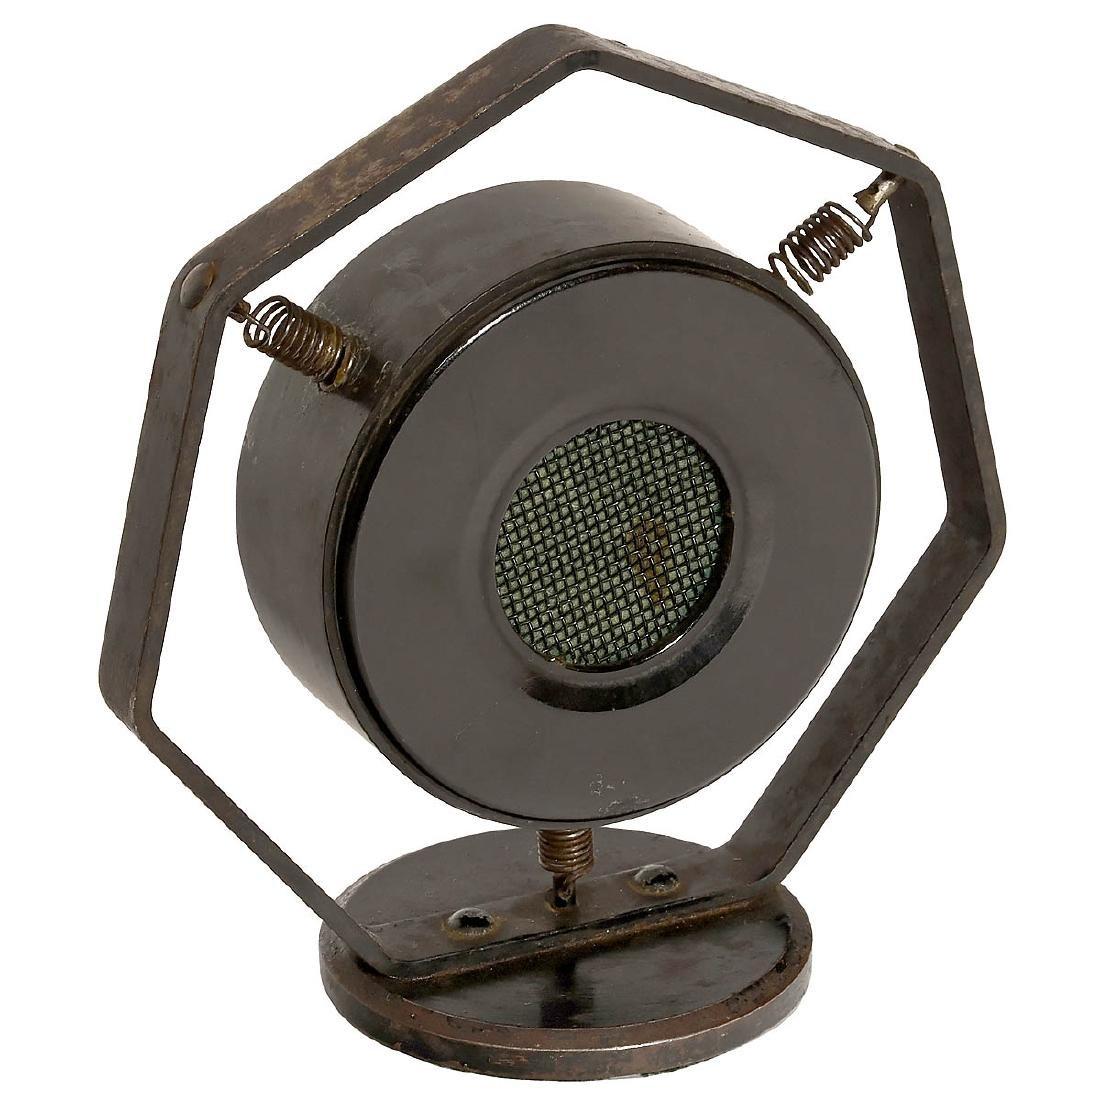 Philips Microphone, c. 1930